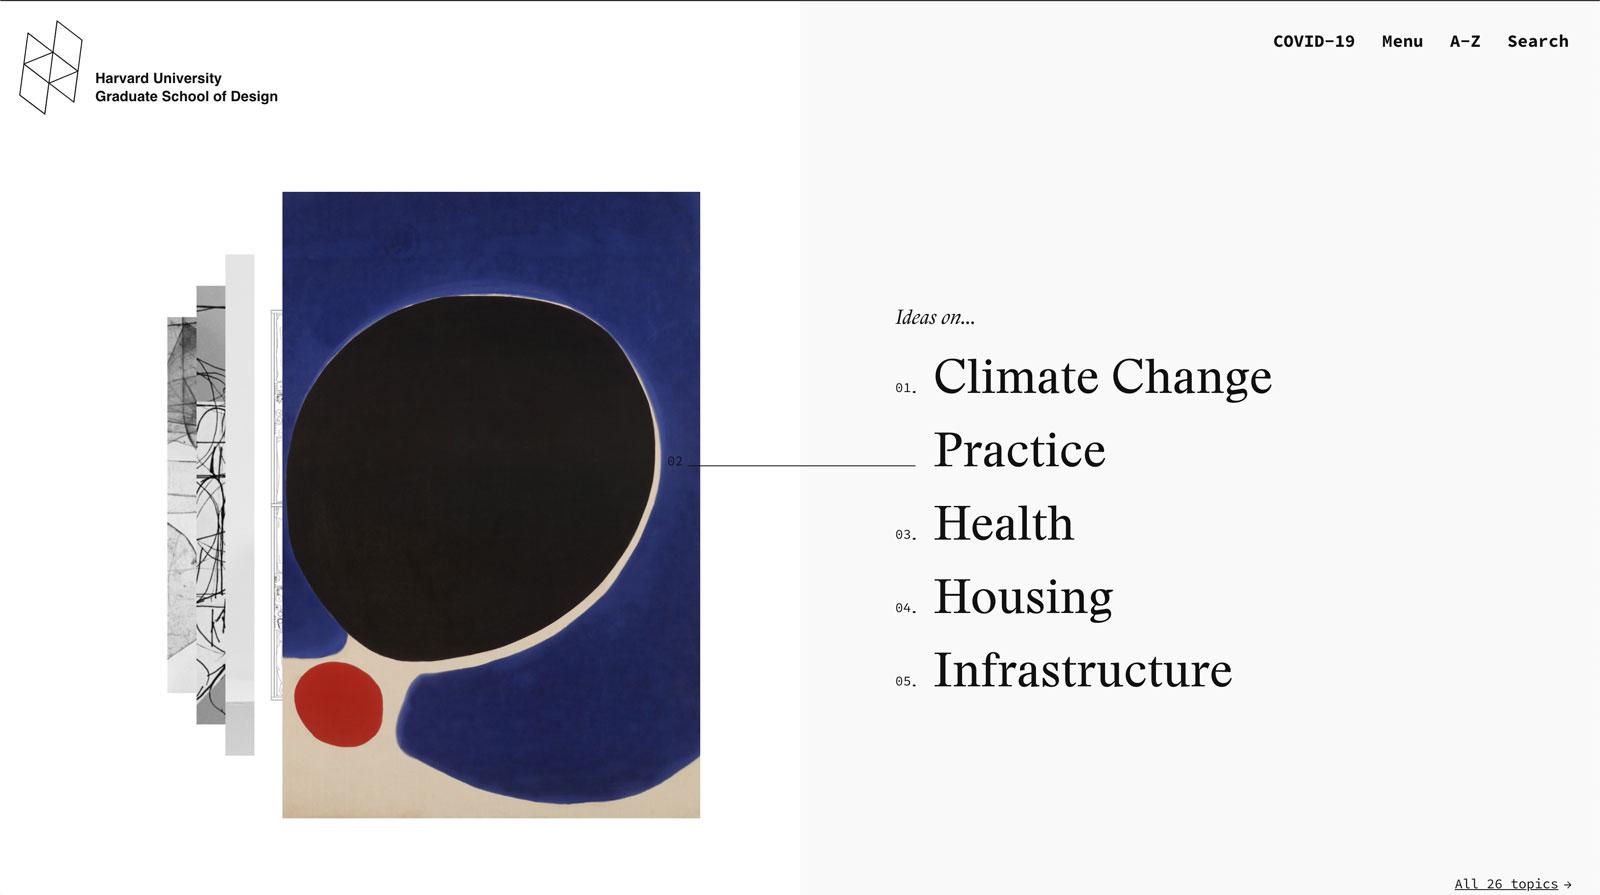 Tease image for Harvard University Graduate School of Design